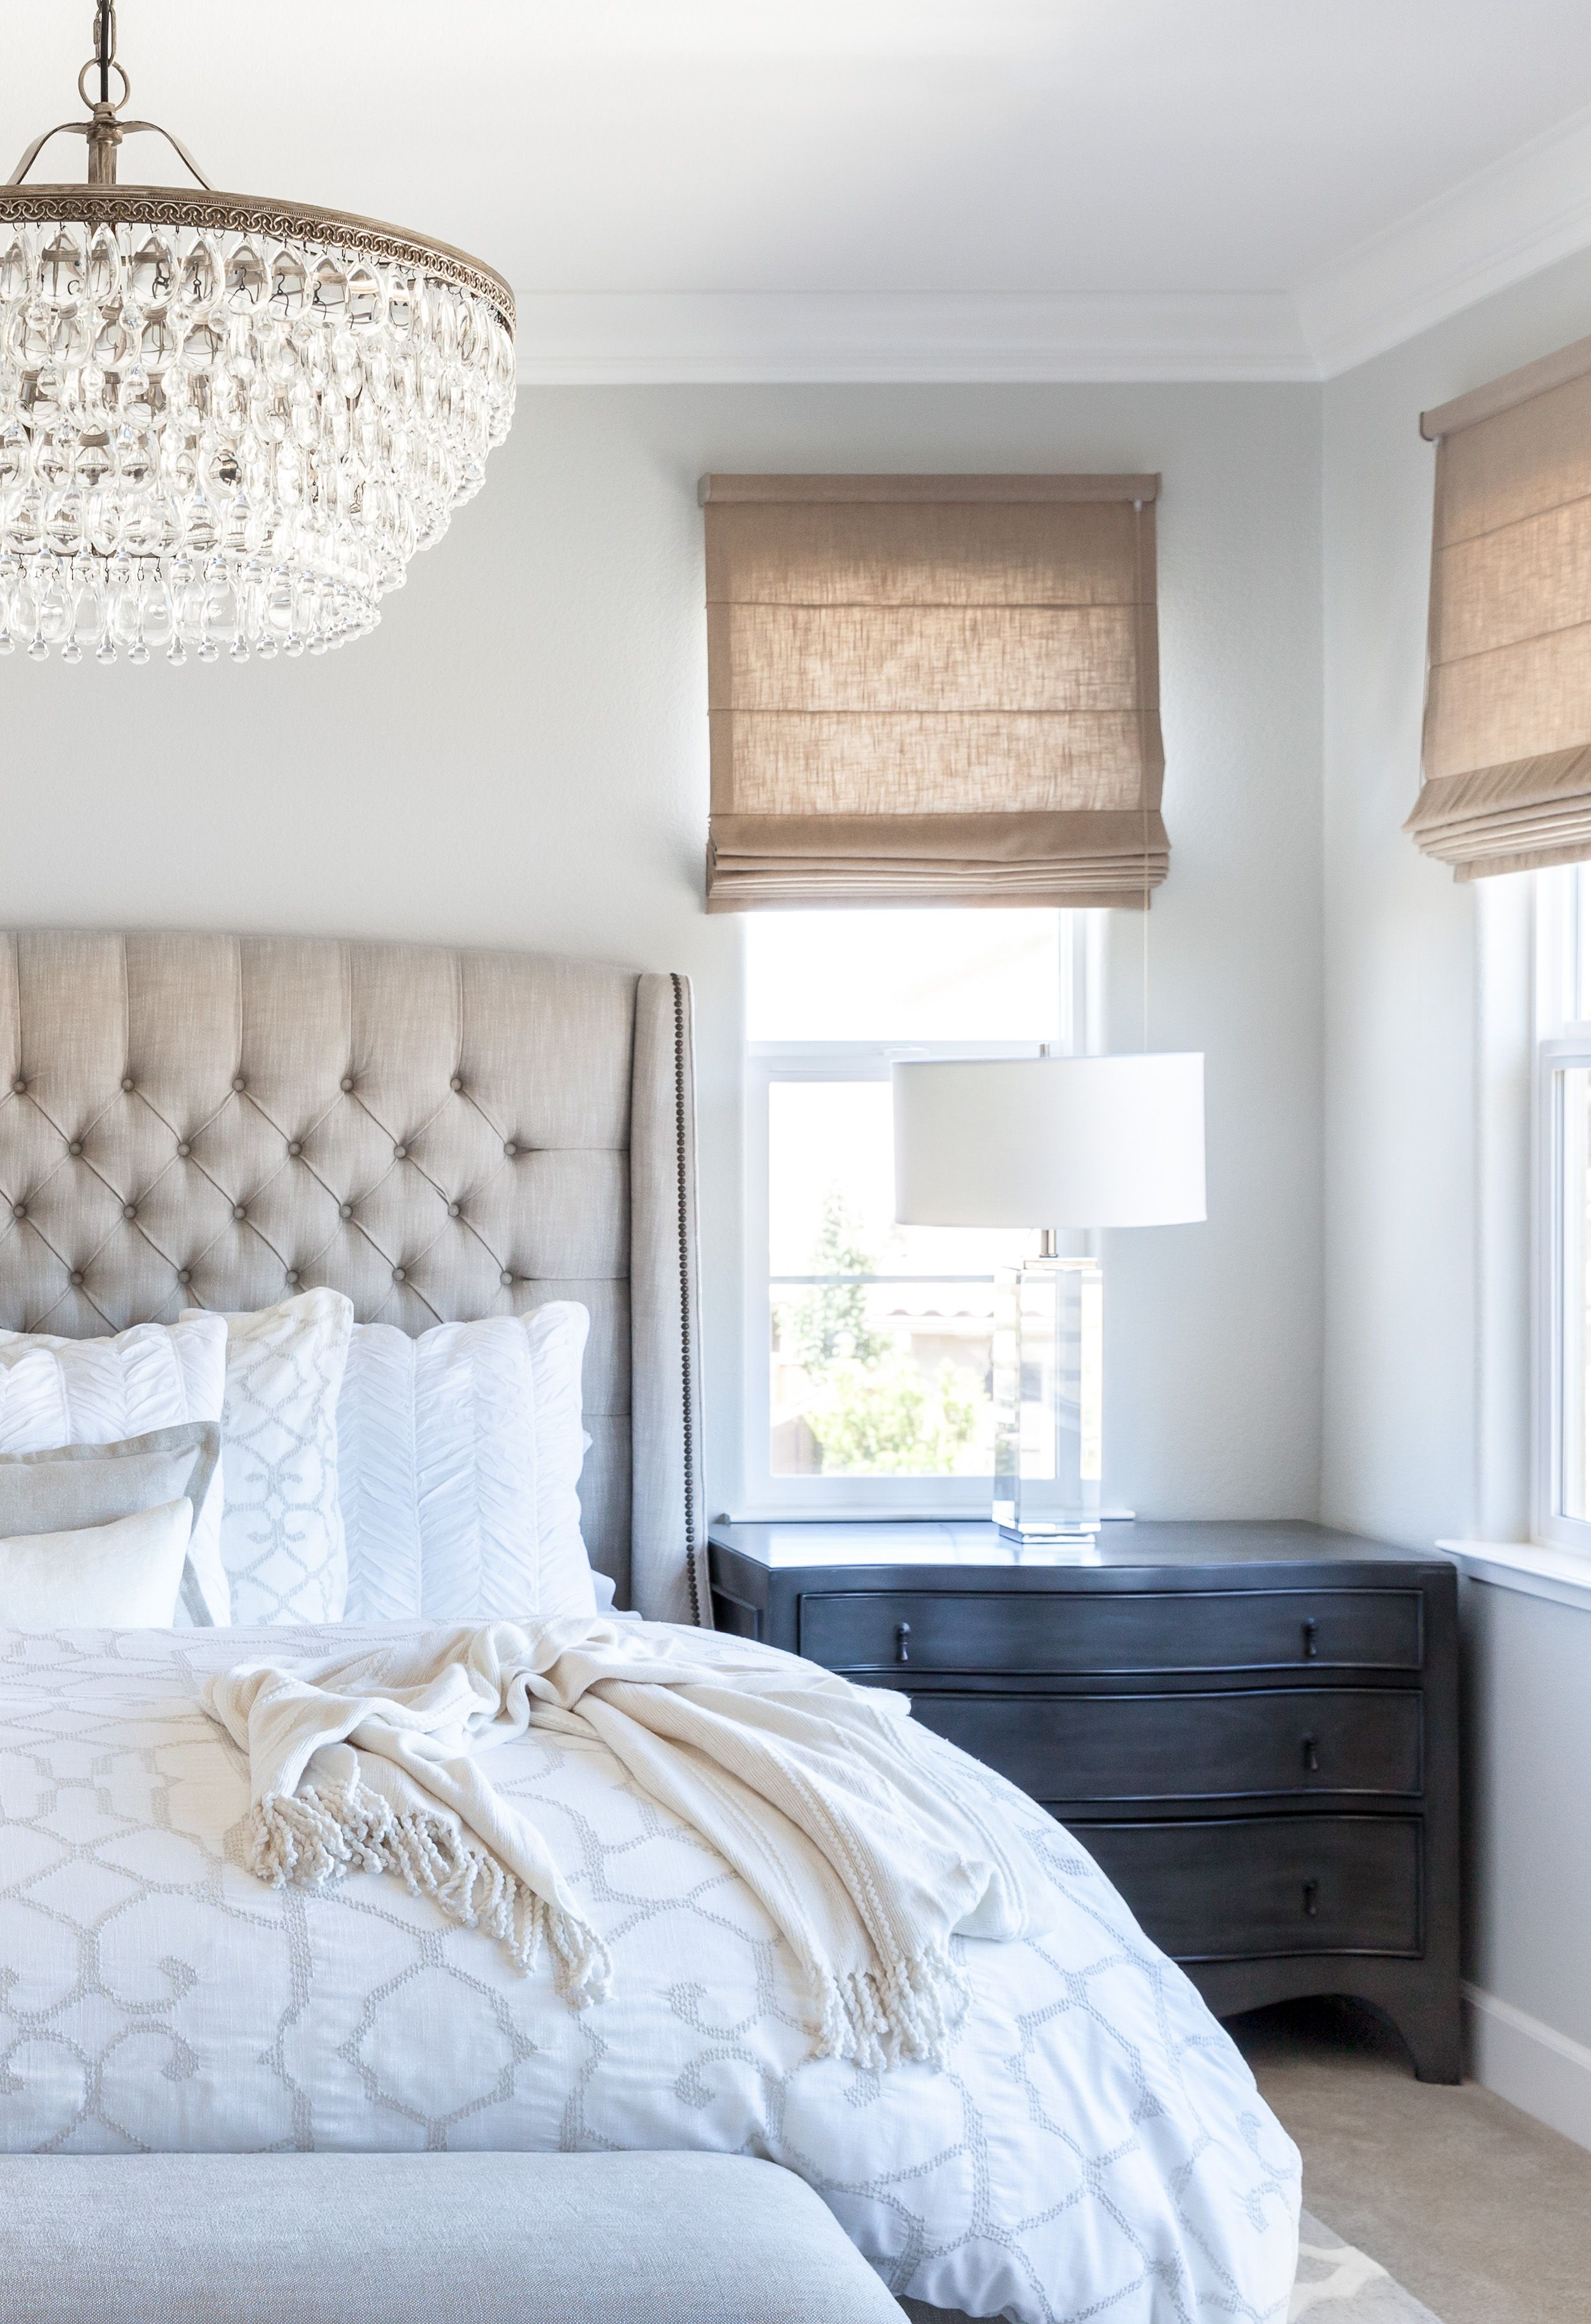 Master Bedroom Calming Master Bedroom Linen Bed Gray Walls